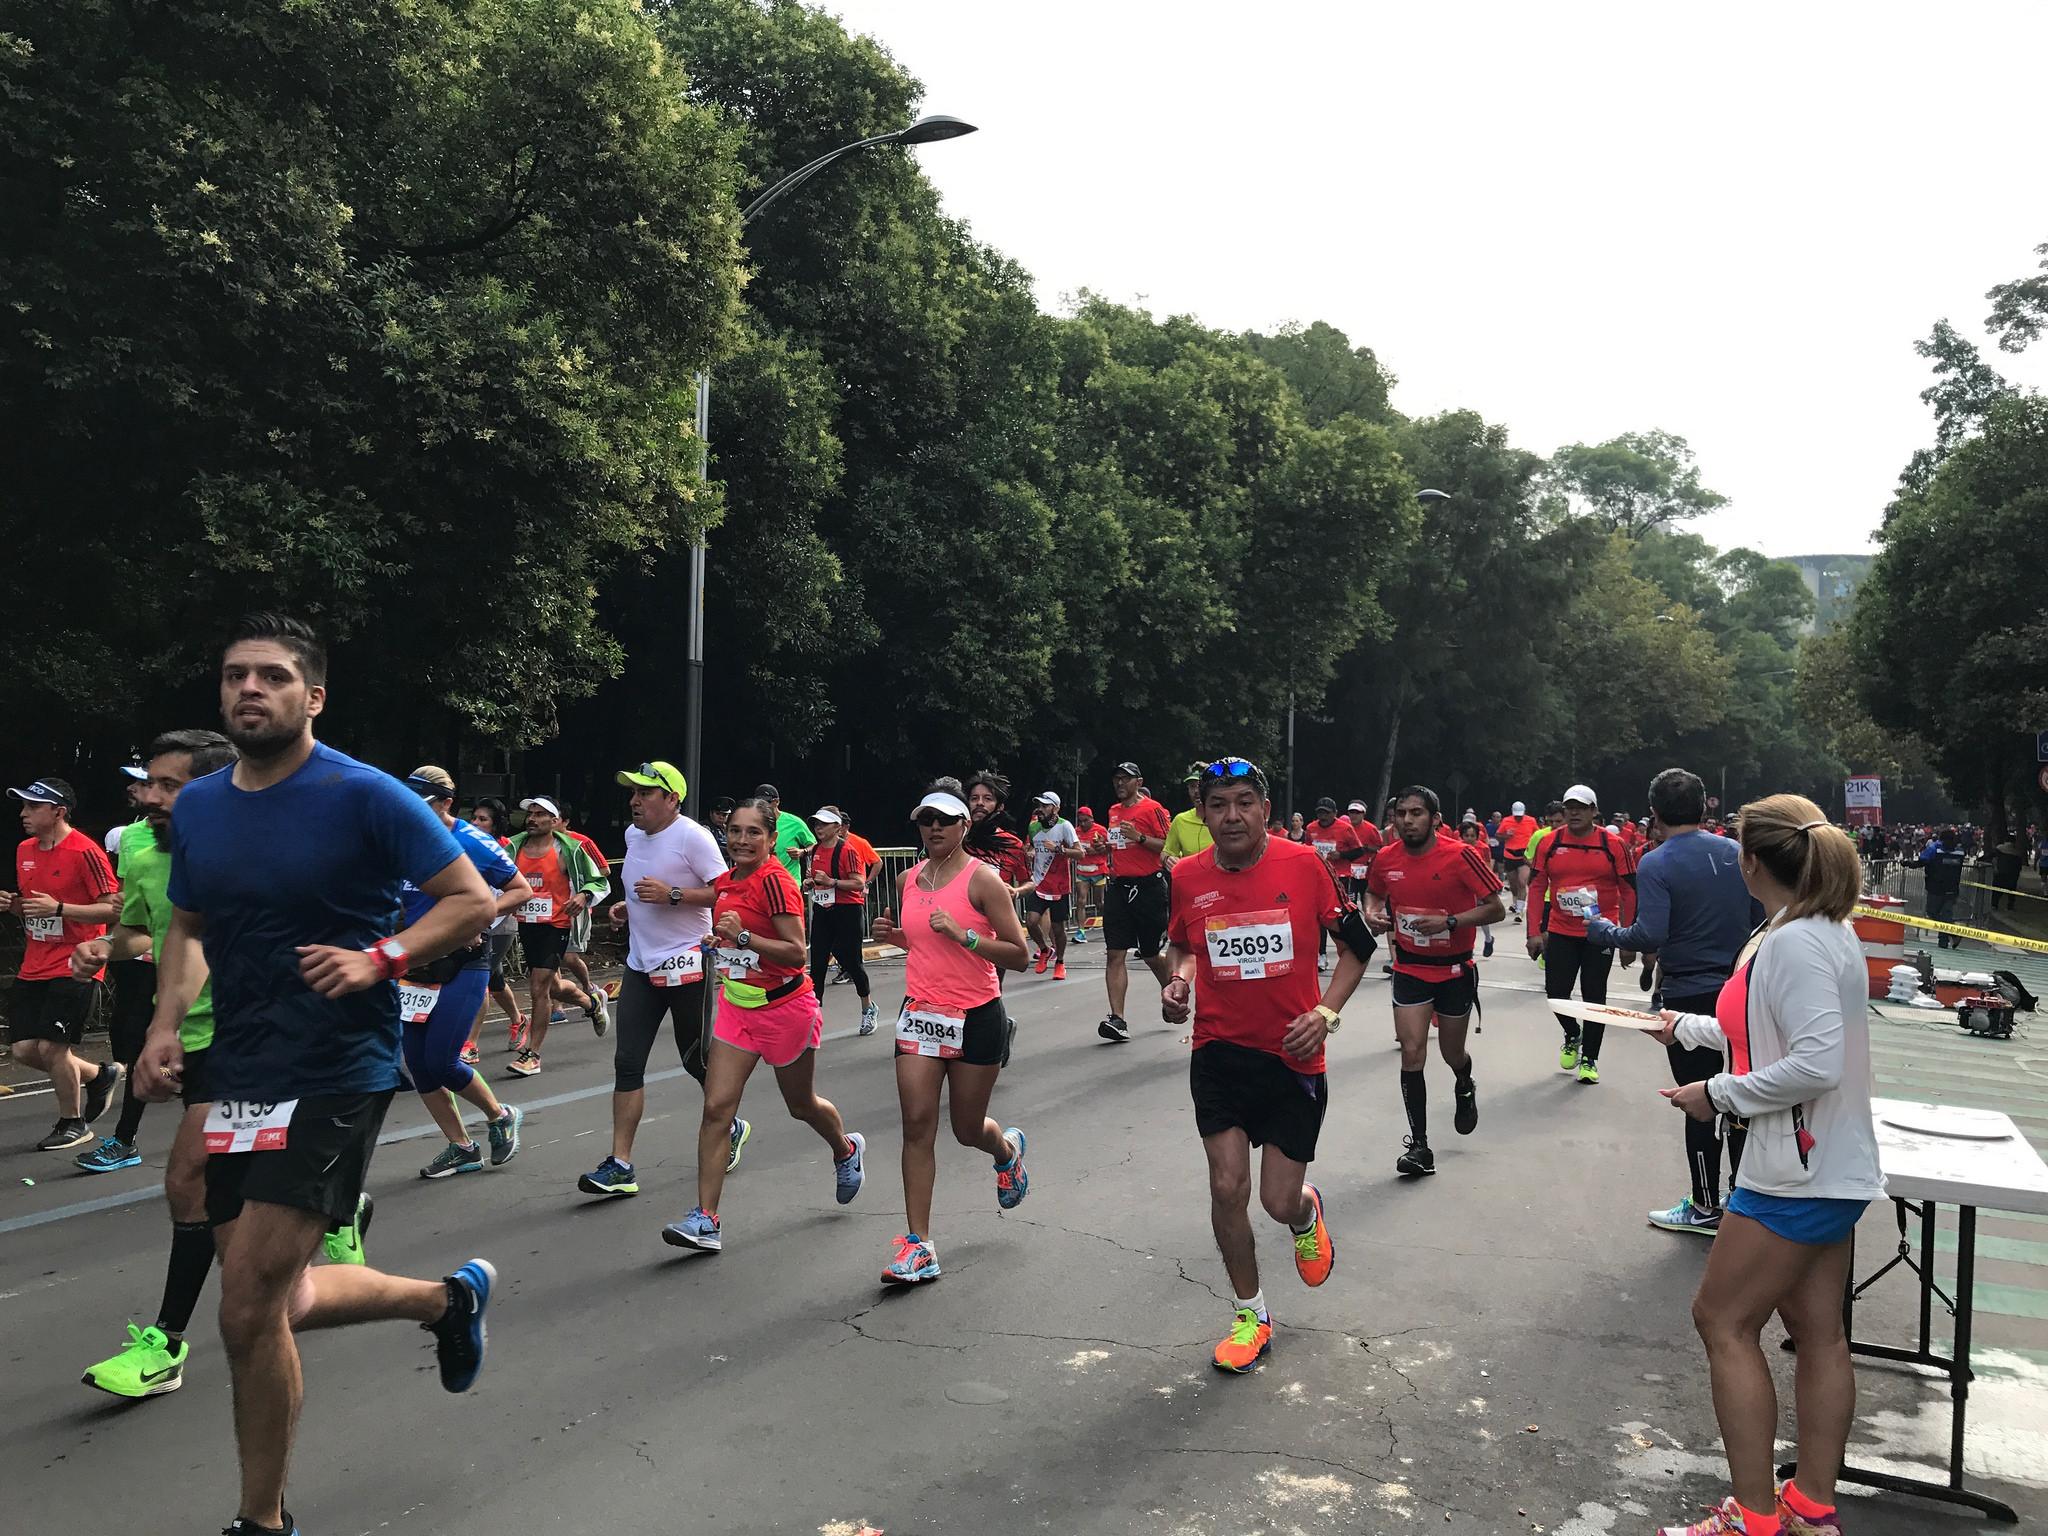 calendario maratones en mexico 2018 runmx